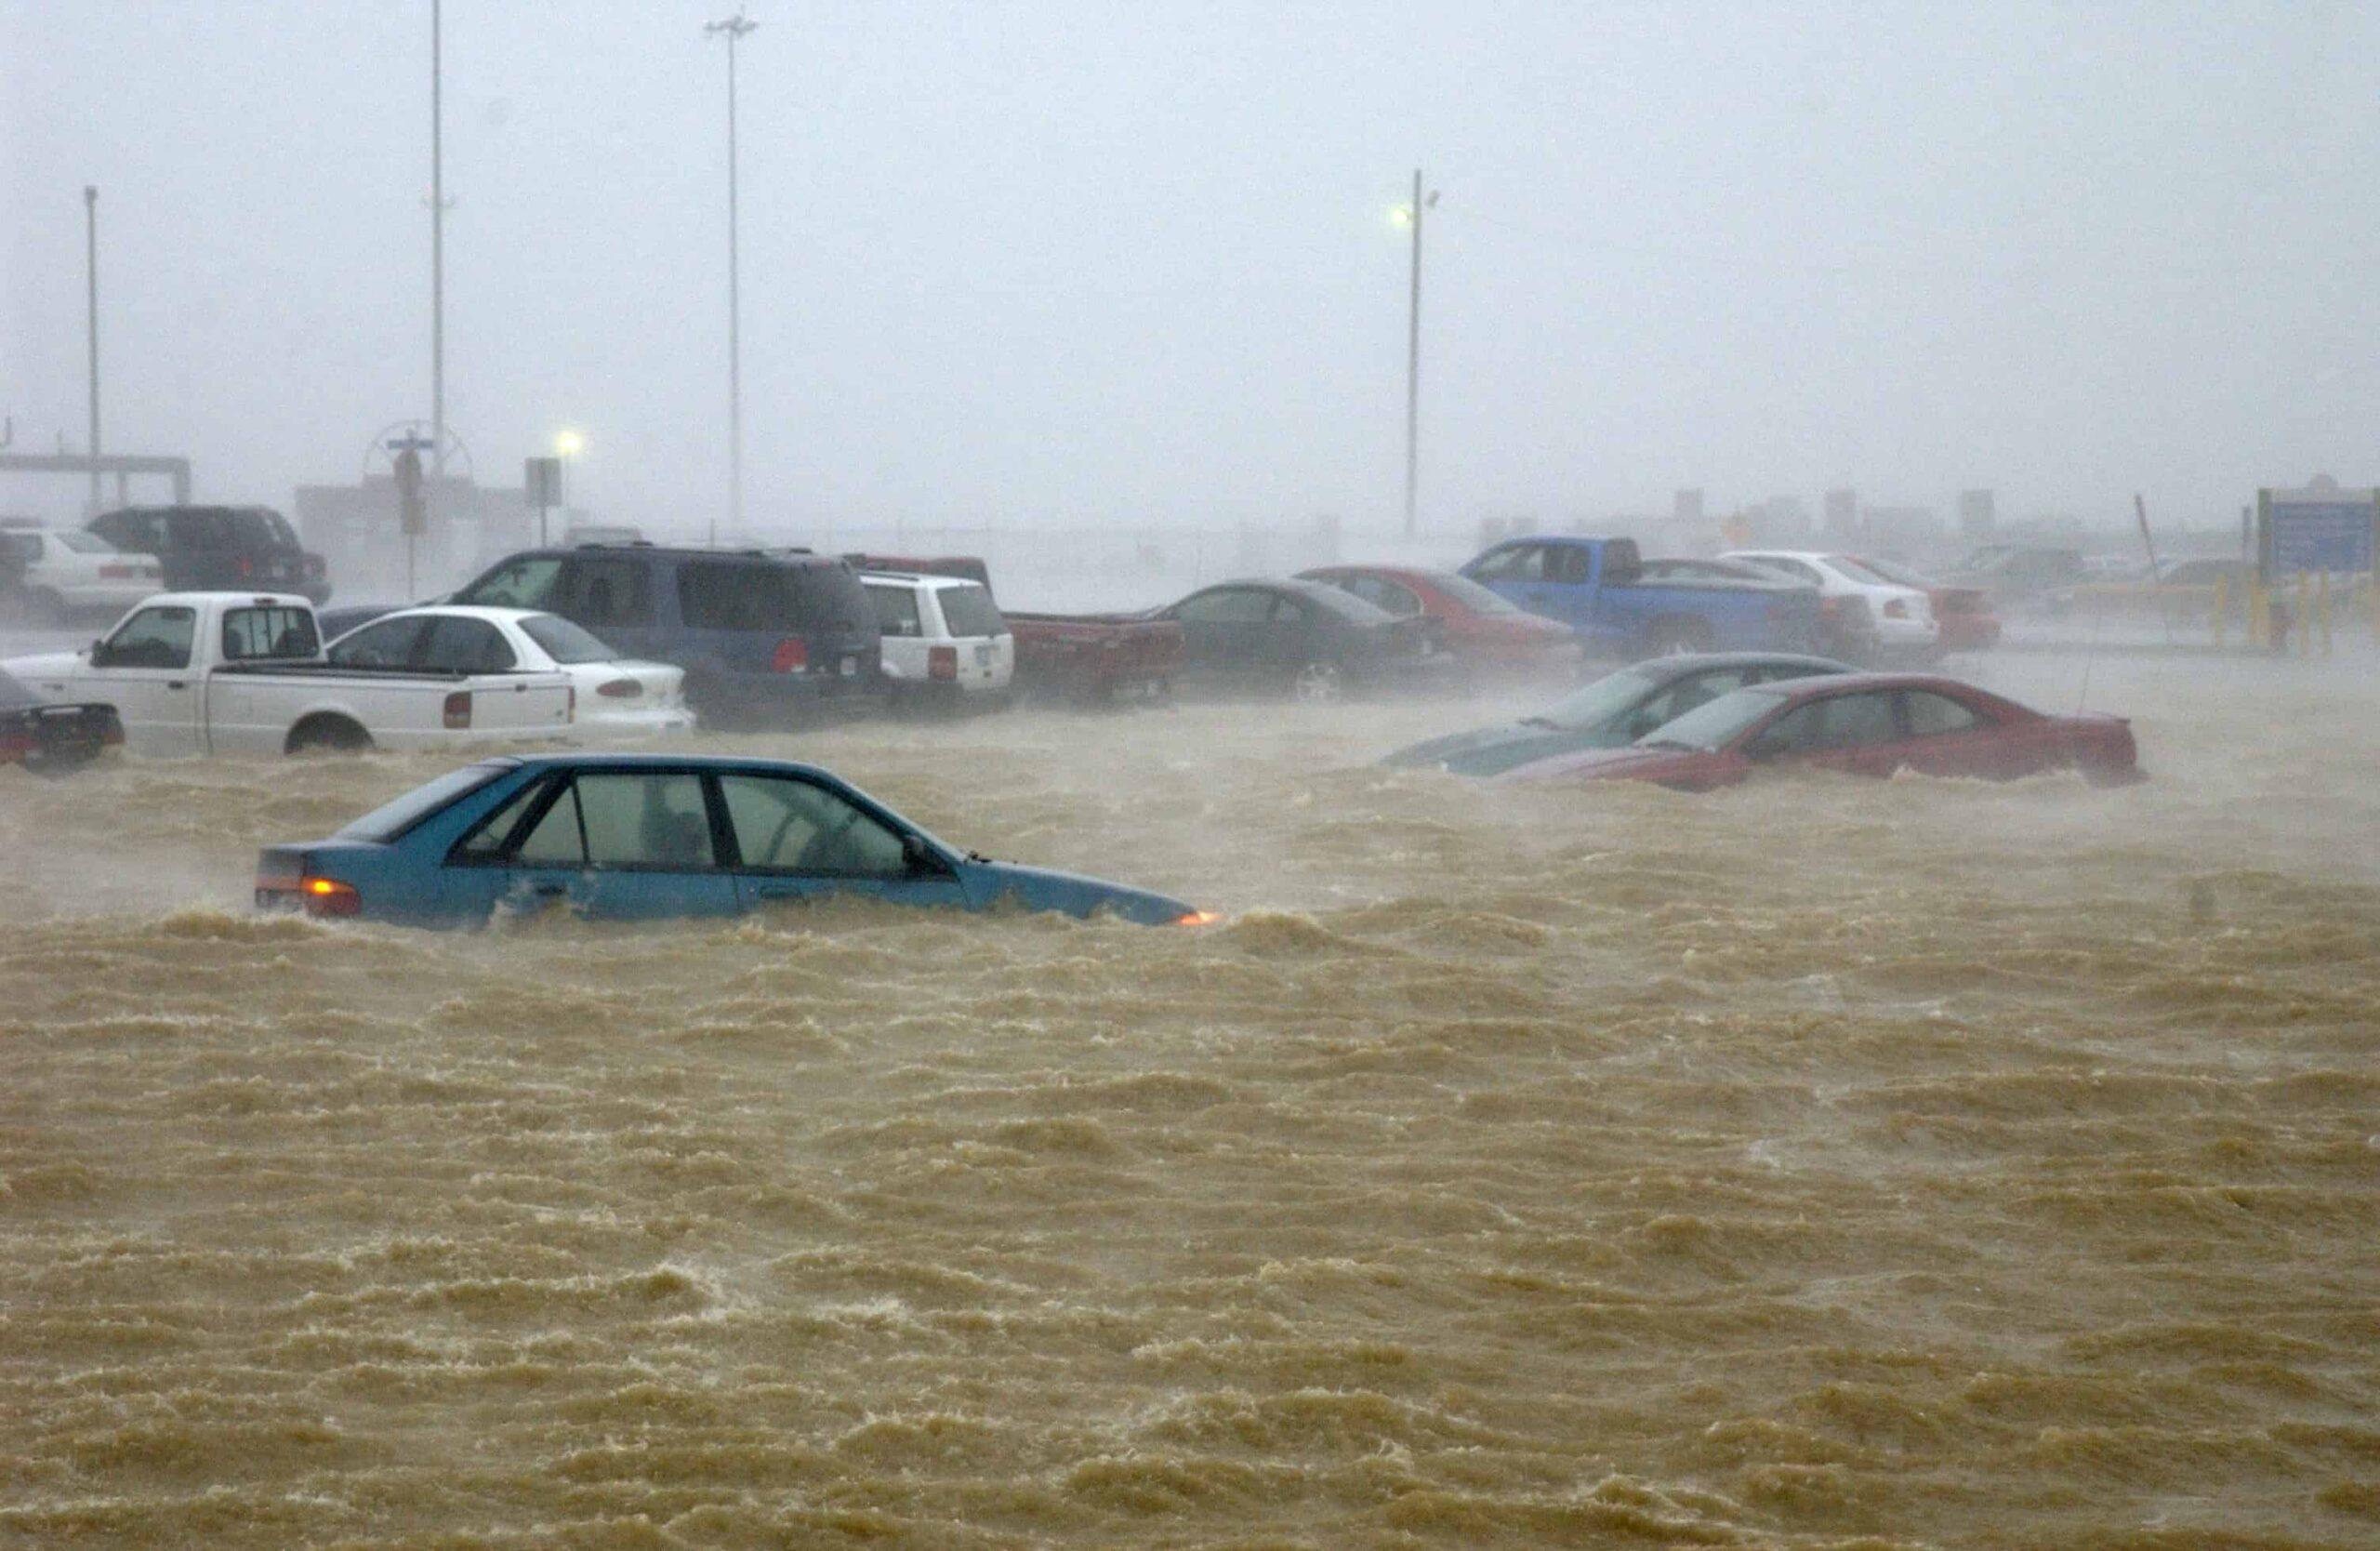 Flooding in Norfolk, VA